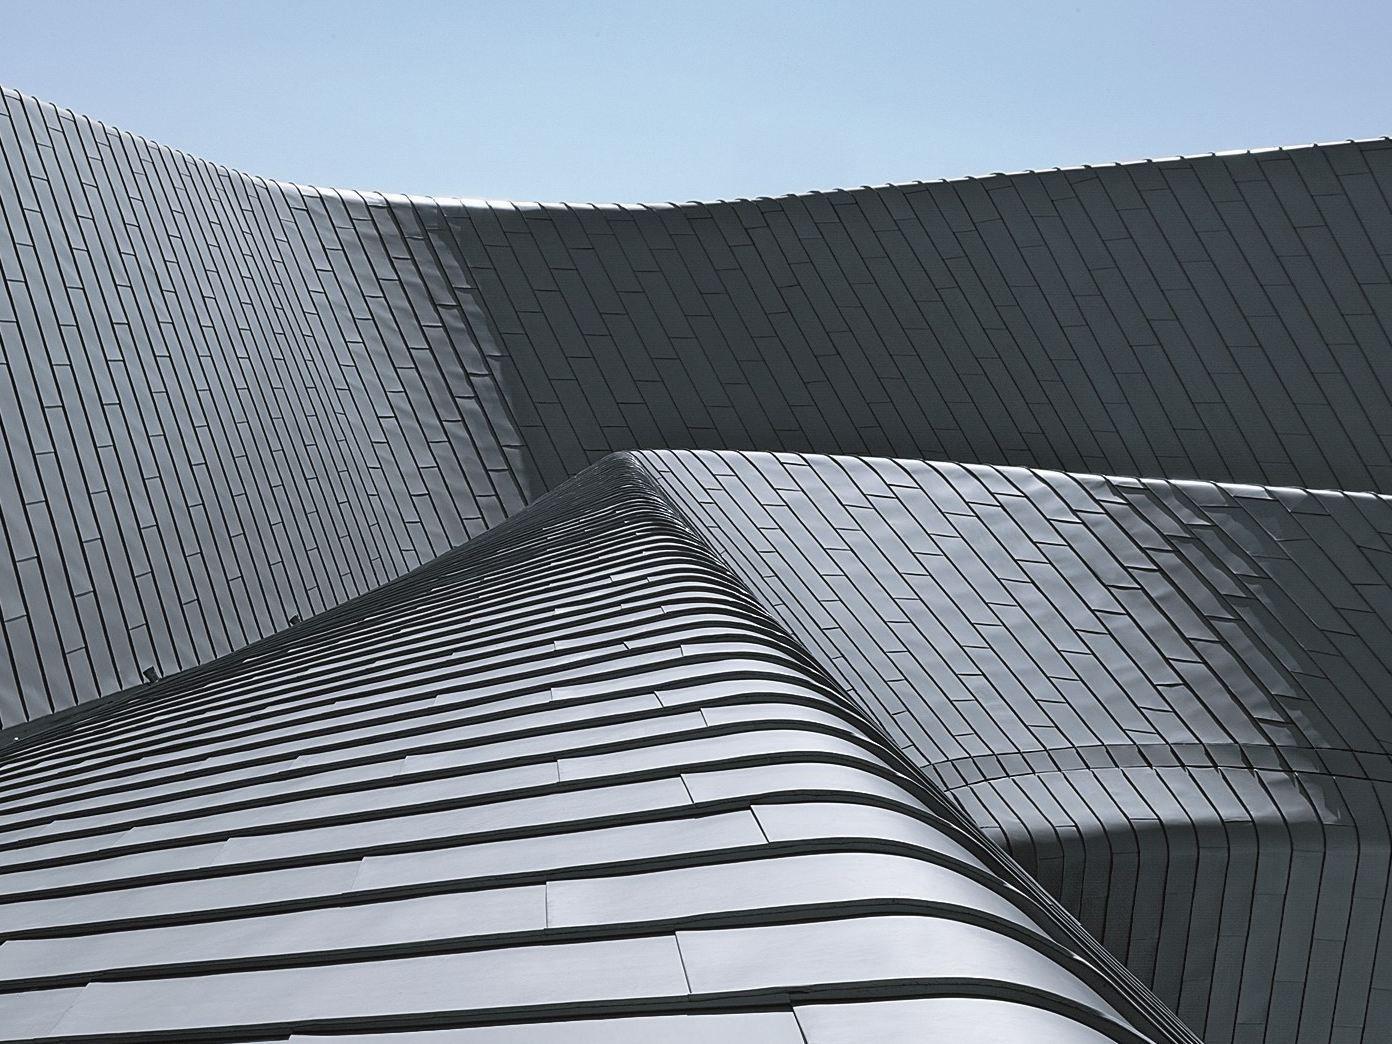 Titanium Zinc Metal Sheet And Panel For Roof Patina Line